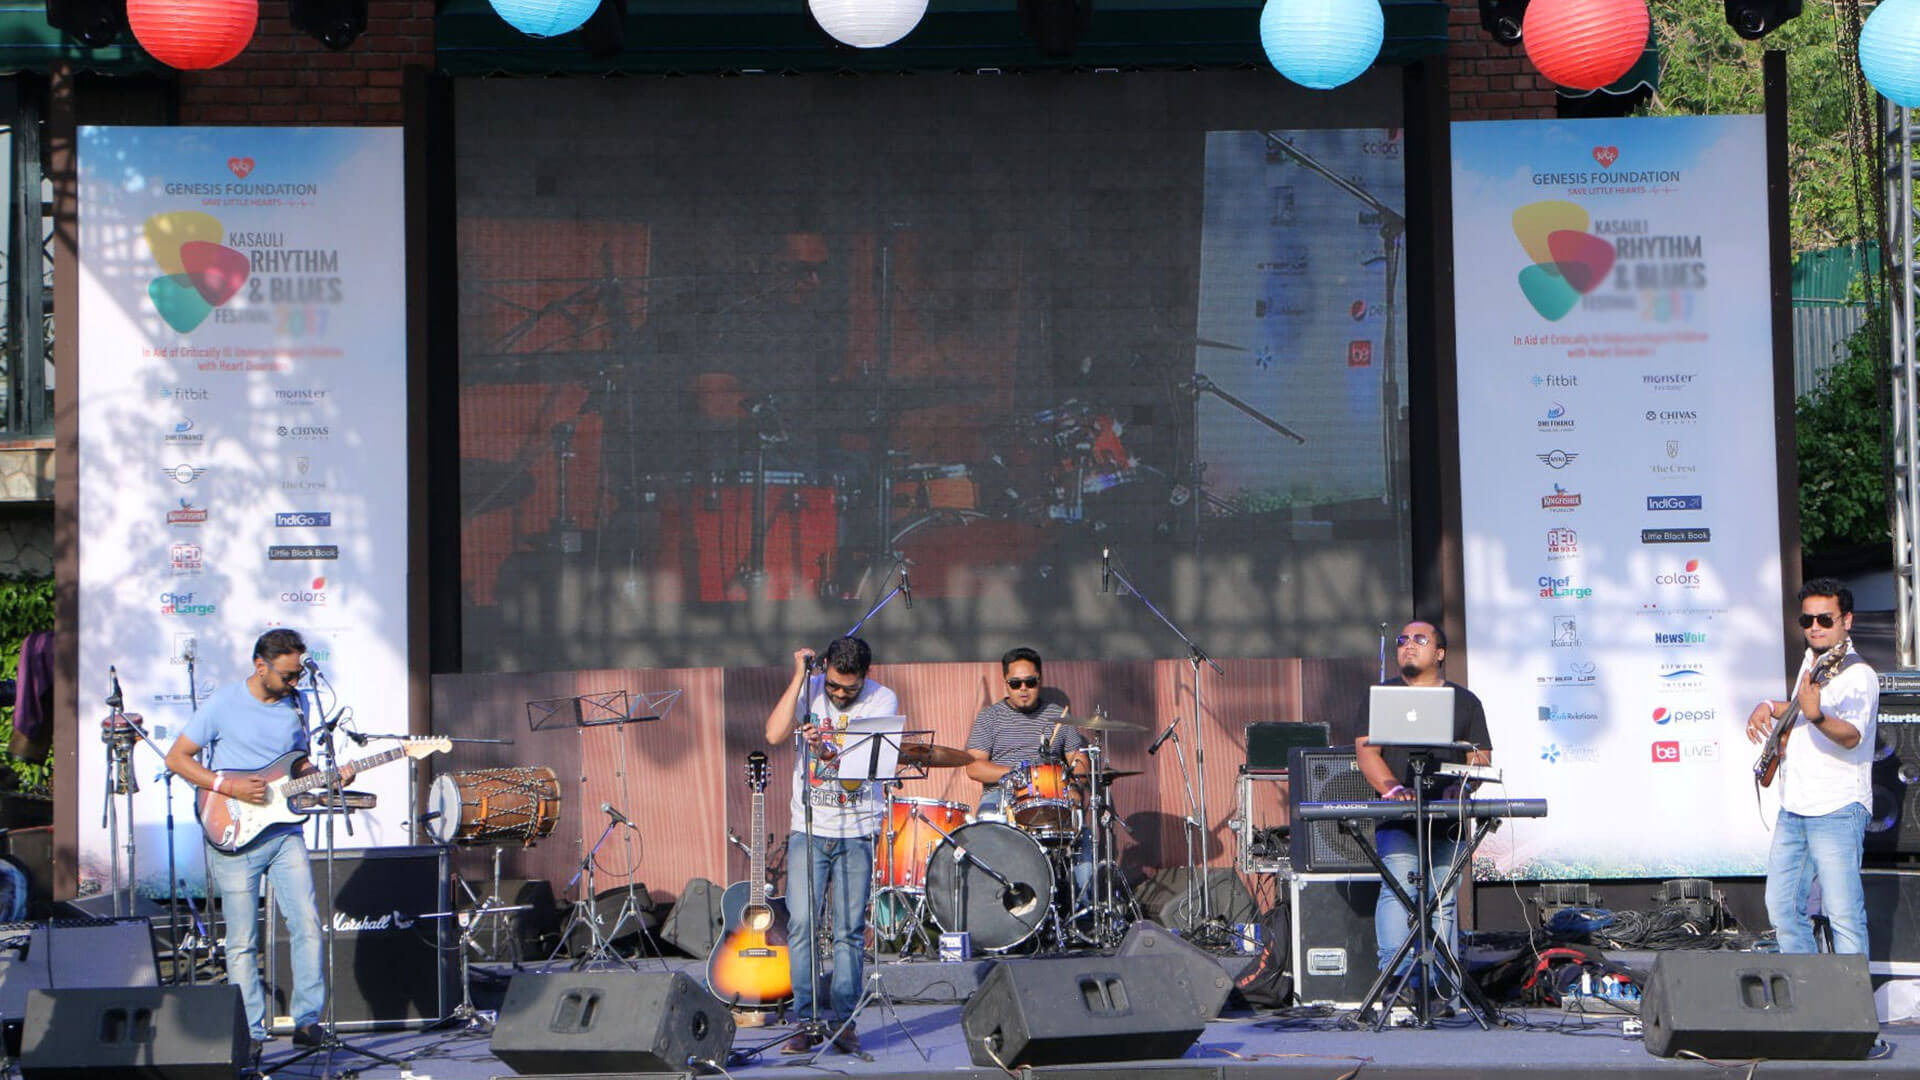 Kasauli_Rhythm_and_Blues_Festival_Attractions